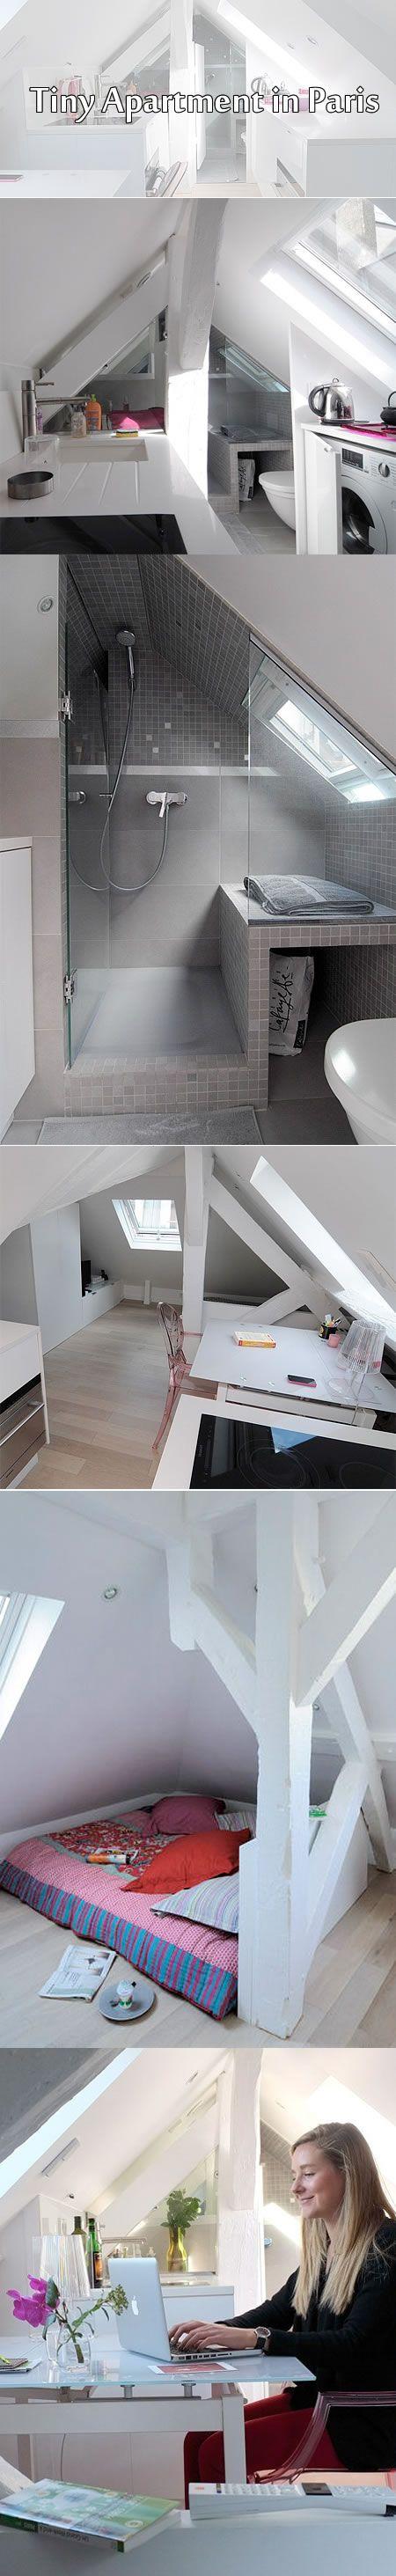 Tiny studio apartment in Paris. Compact living. White. Attic apartment. Scandinavian style.